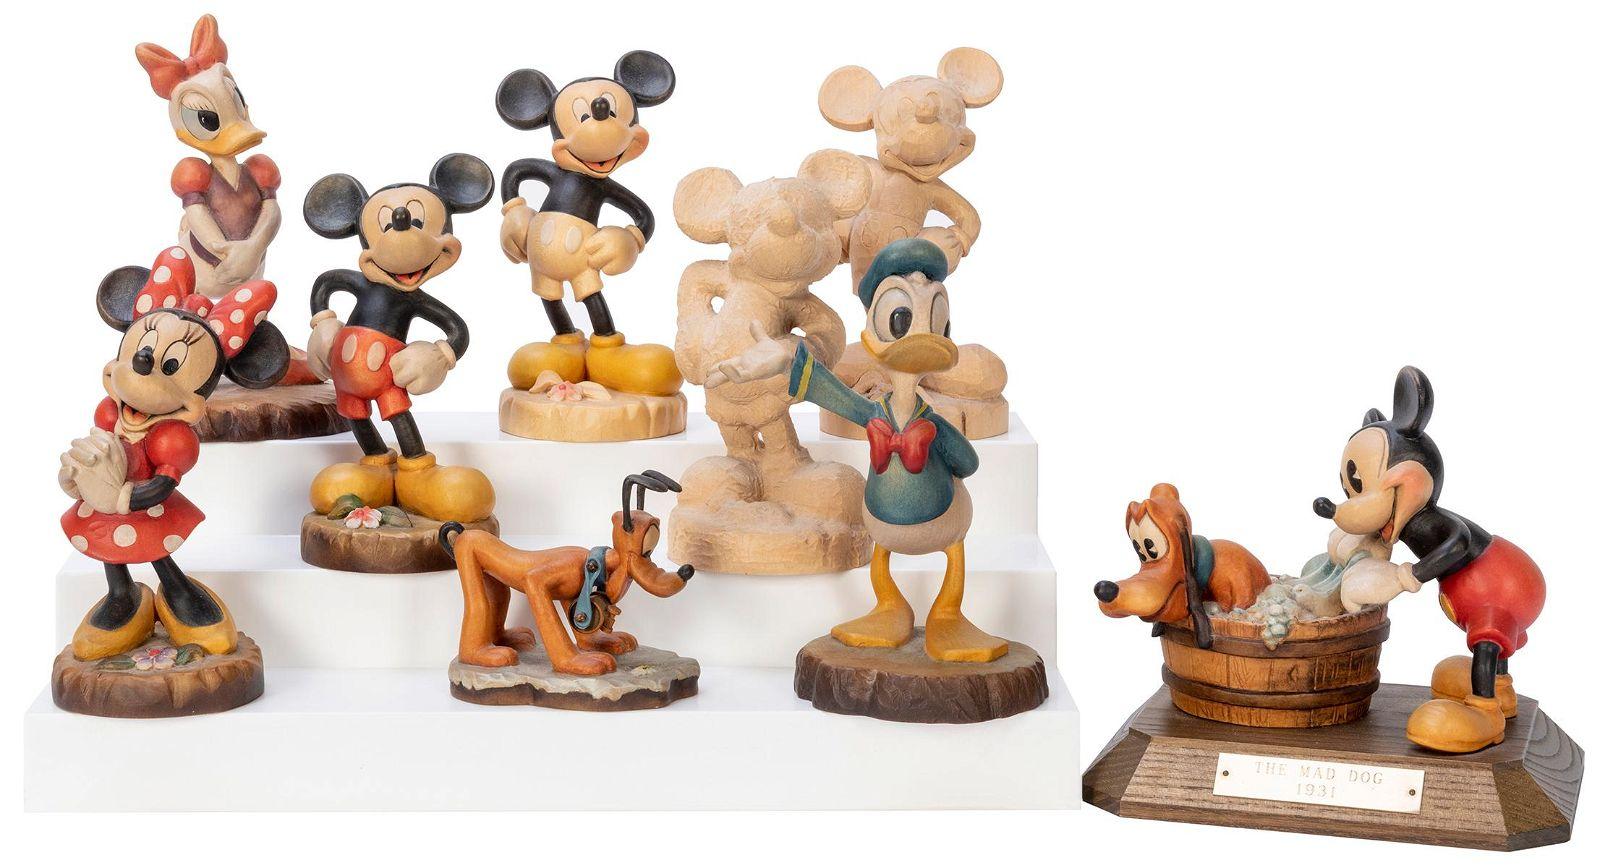 ANRI Lot of Nine Handcrafted Wooden Disney Figurines.